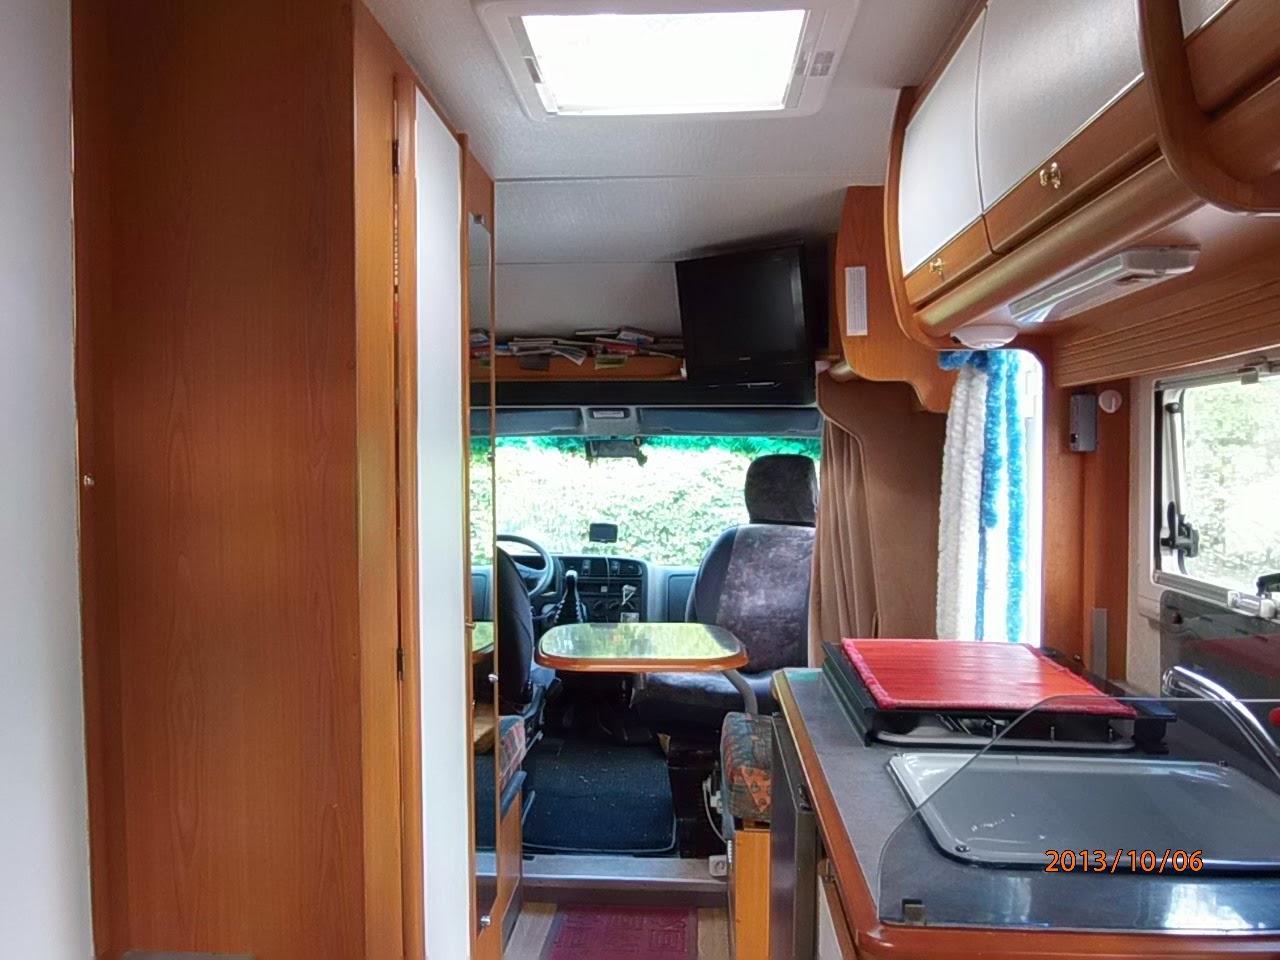 vendanges aires de camping car services et stationnement. Black Bedroom Furniture Sets. Home Design Ideas